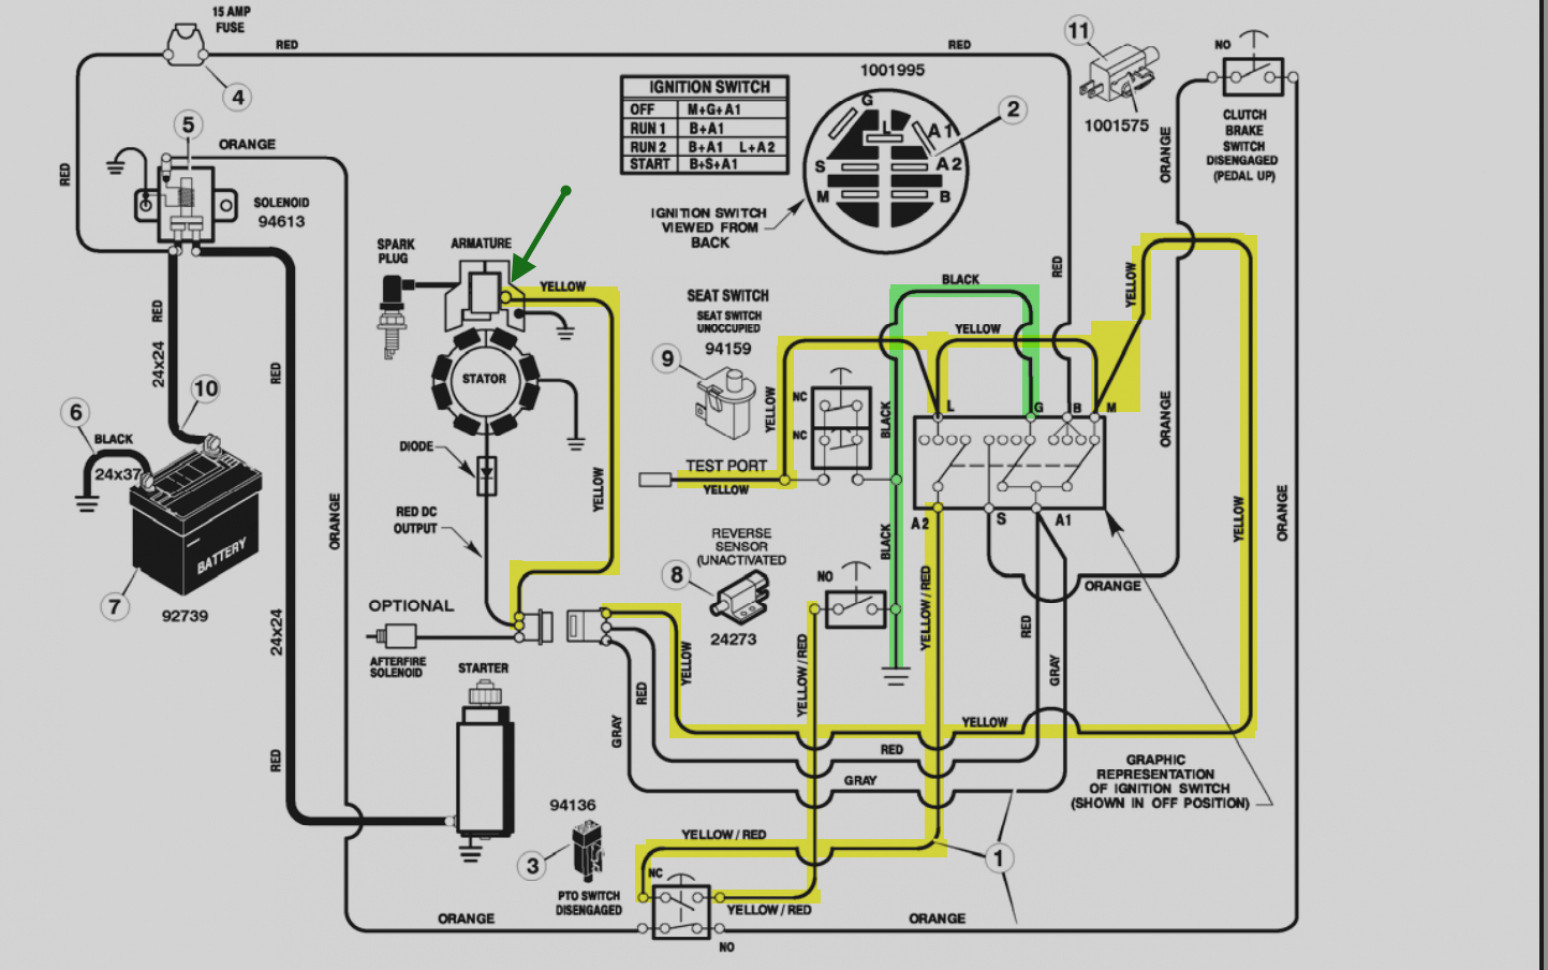 Briggs And Stratton Key Switch Wiring Diagram - Free Wiring Diagram - Lawn Mower Ignition Switch Wiring Diagram